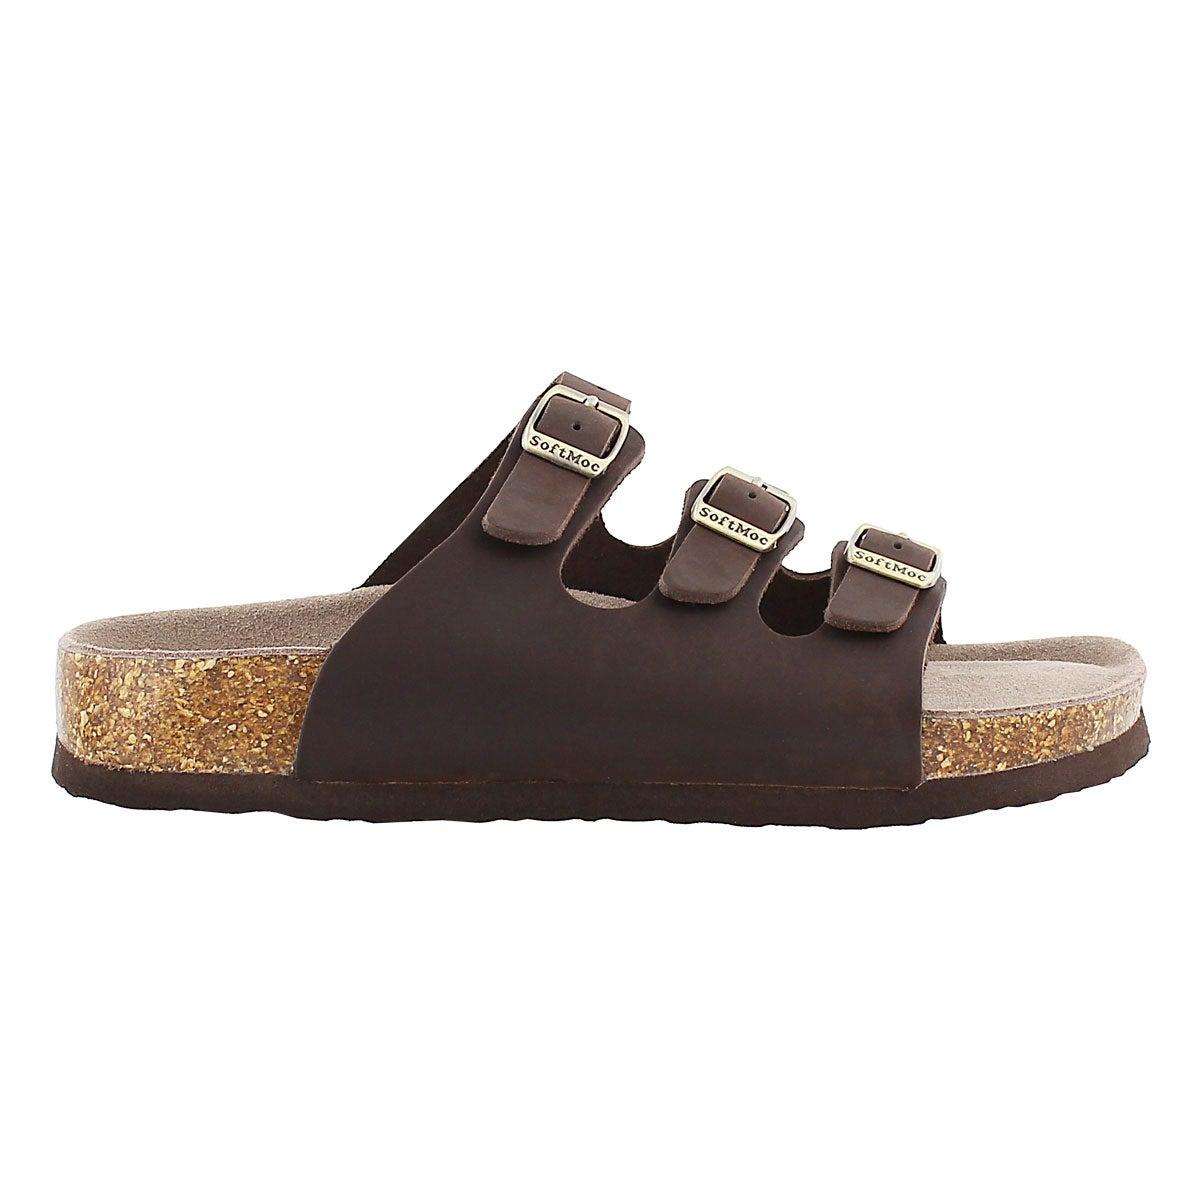 Lds Alexis 2 brn crz memory foam sandal